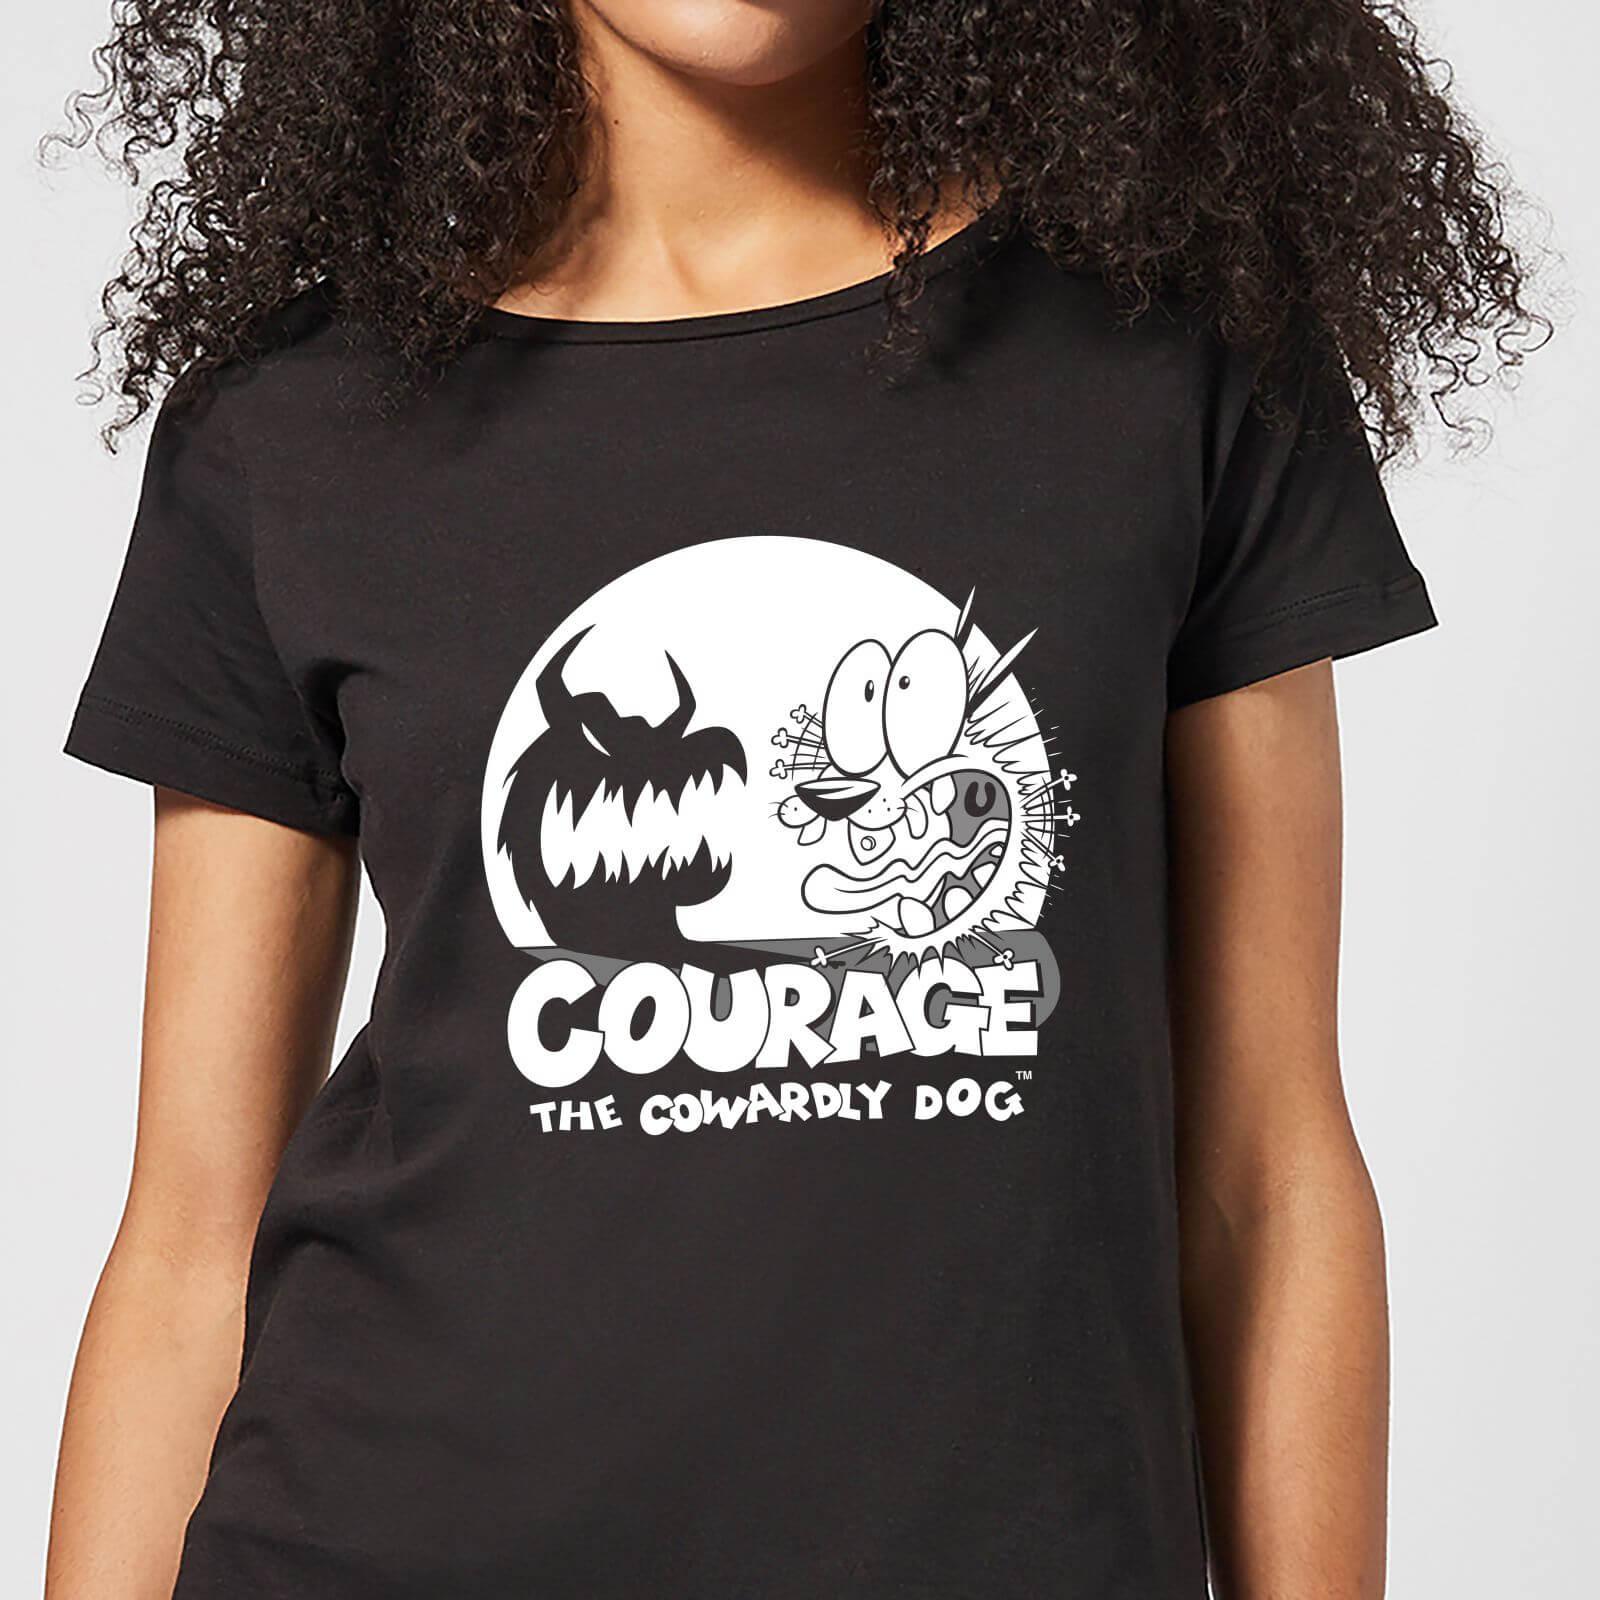 Cartoon Network Courage The Cowardly Dog Spotlight Women's T-Shirt - Black - L